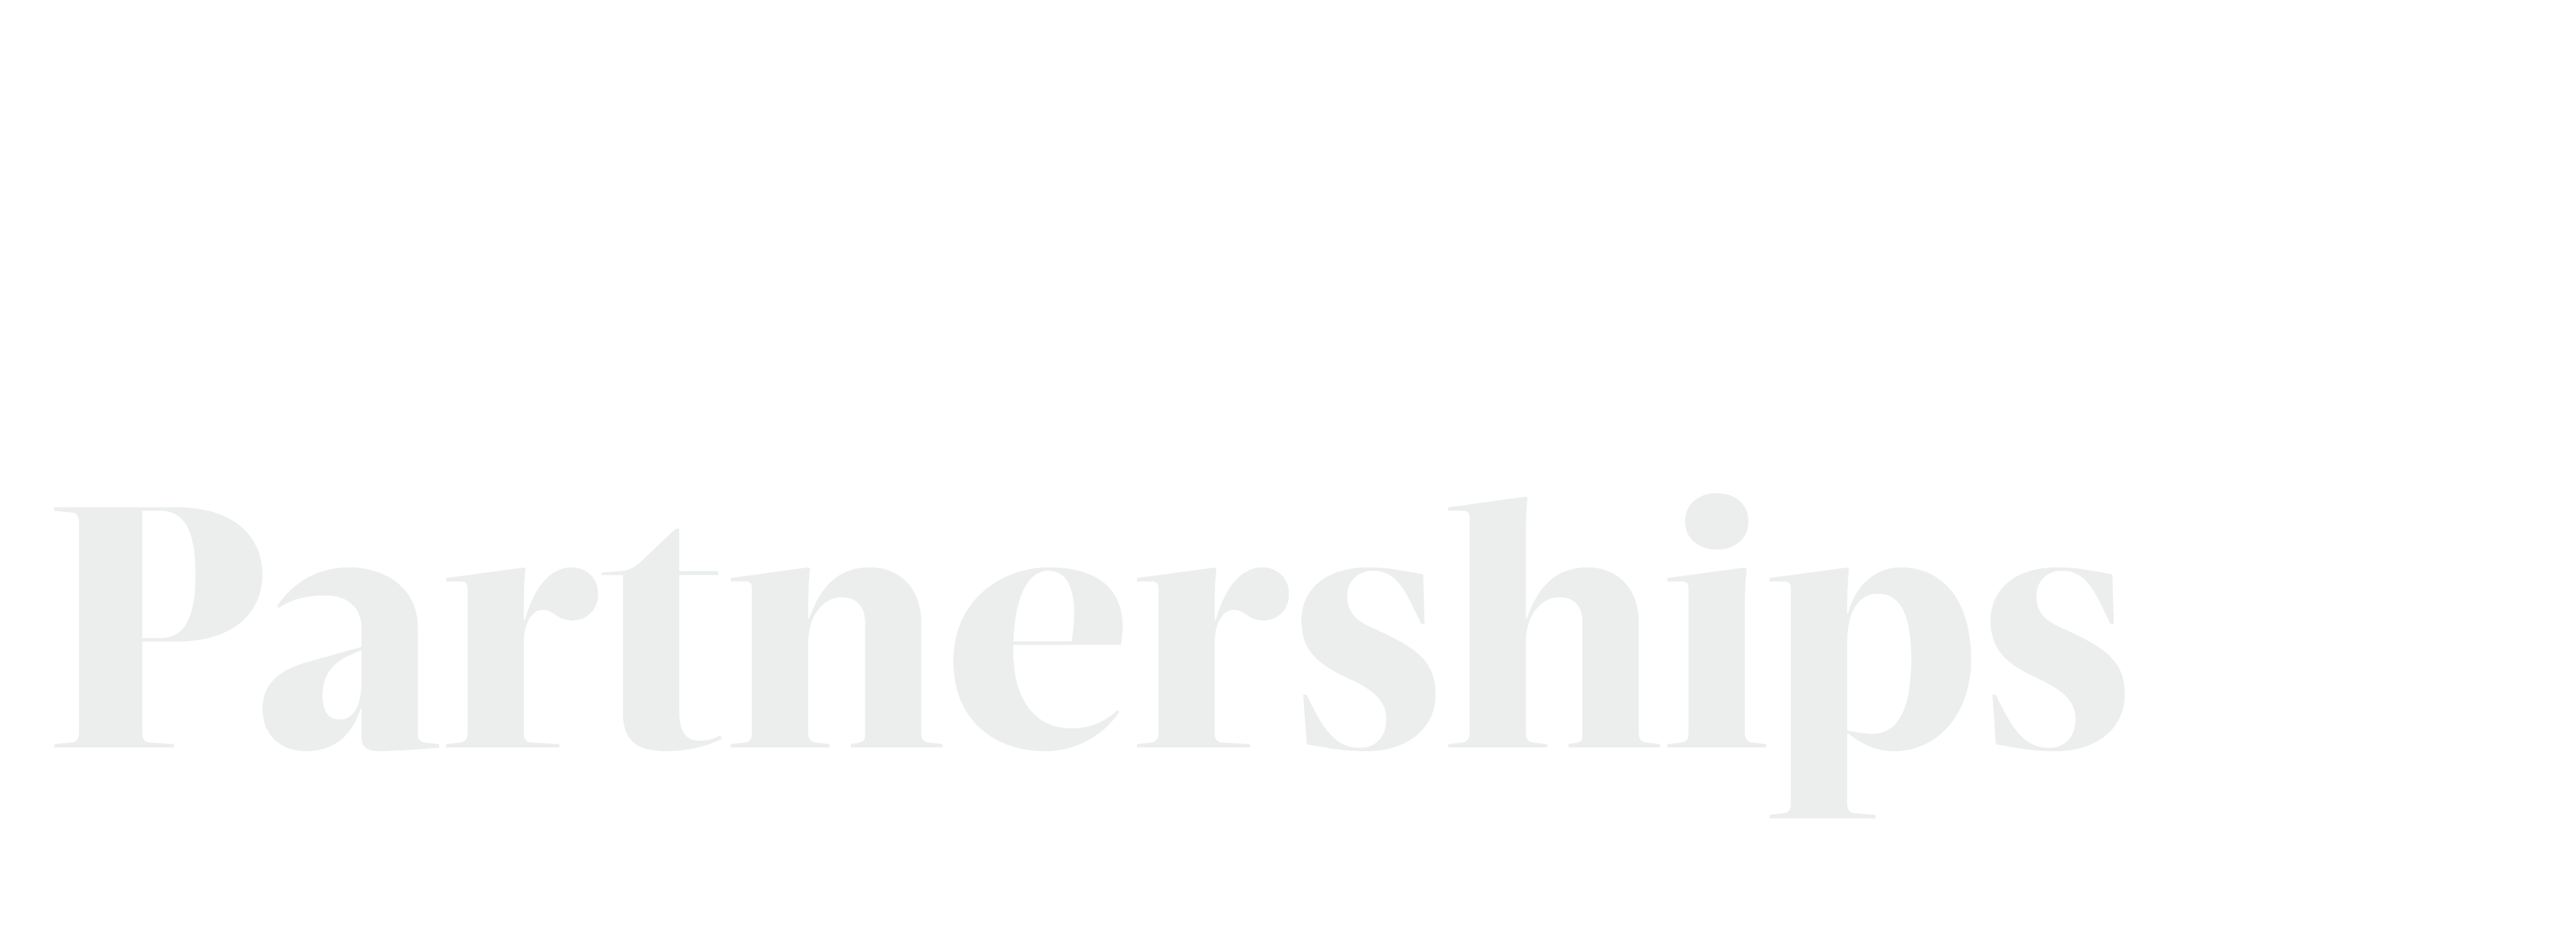 Business Post Partnerships